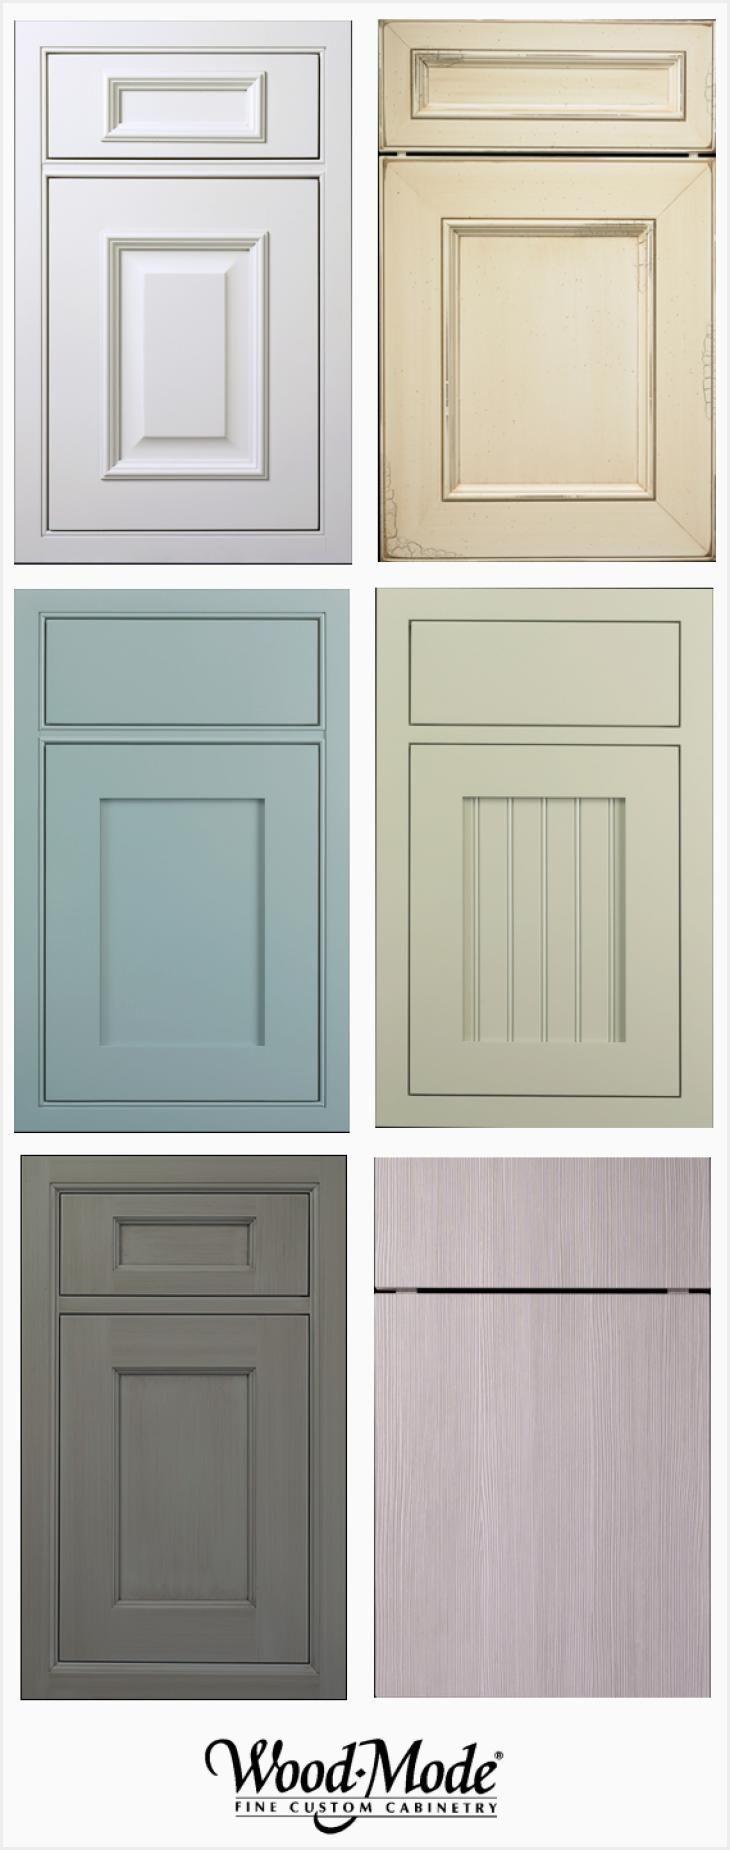 438 Kitchen Cabinets Door Fronts Ideas Modern Kitchen Doors Wood Cabinet Doors Cabinet Door Designs